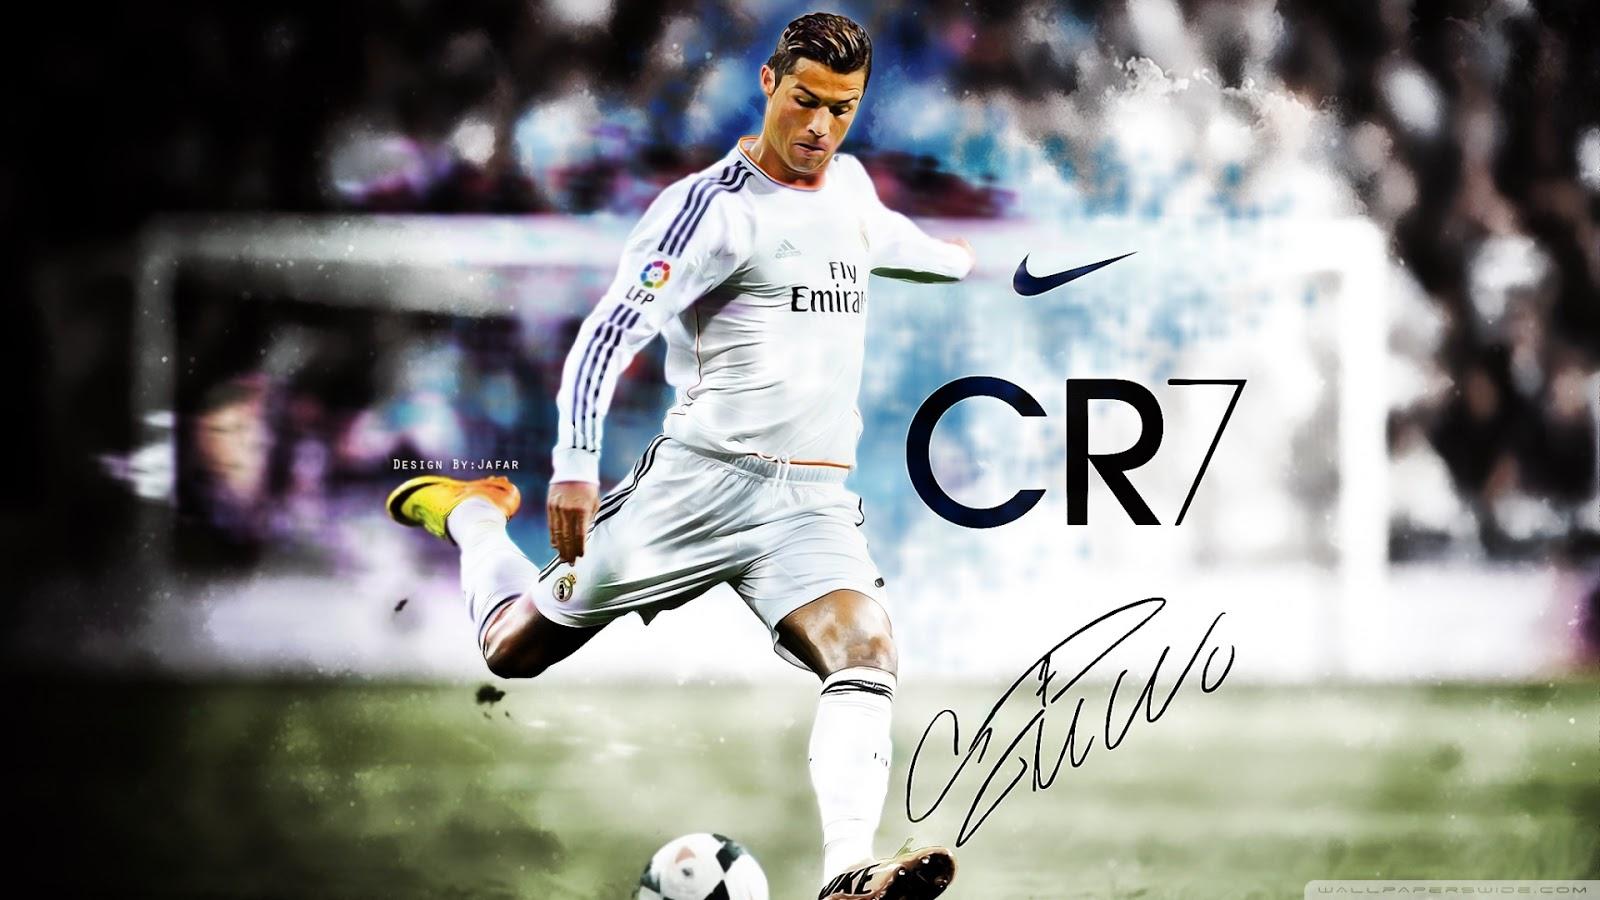 Cristiano ronaldo wallpaper collection pack 1 - Hd photos of cr7 ...